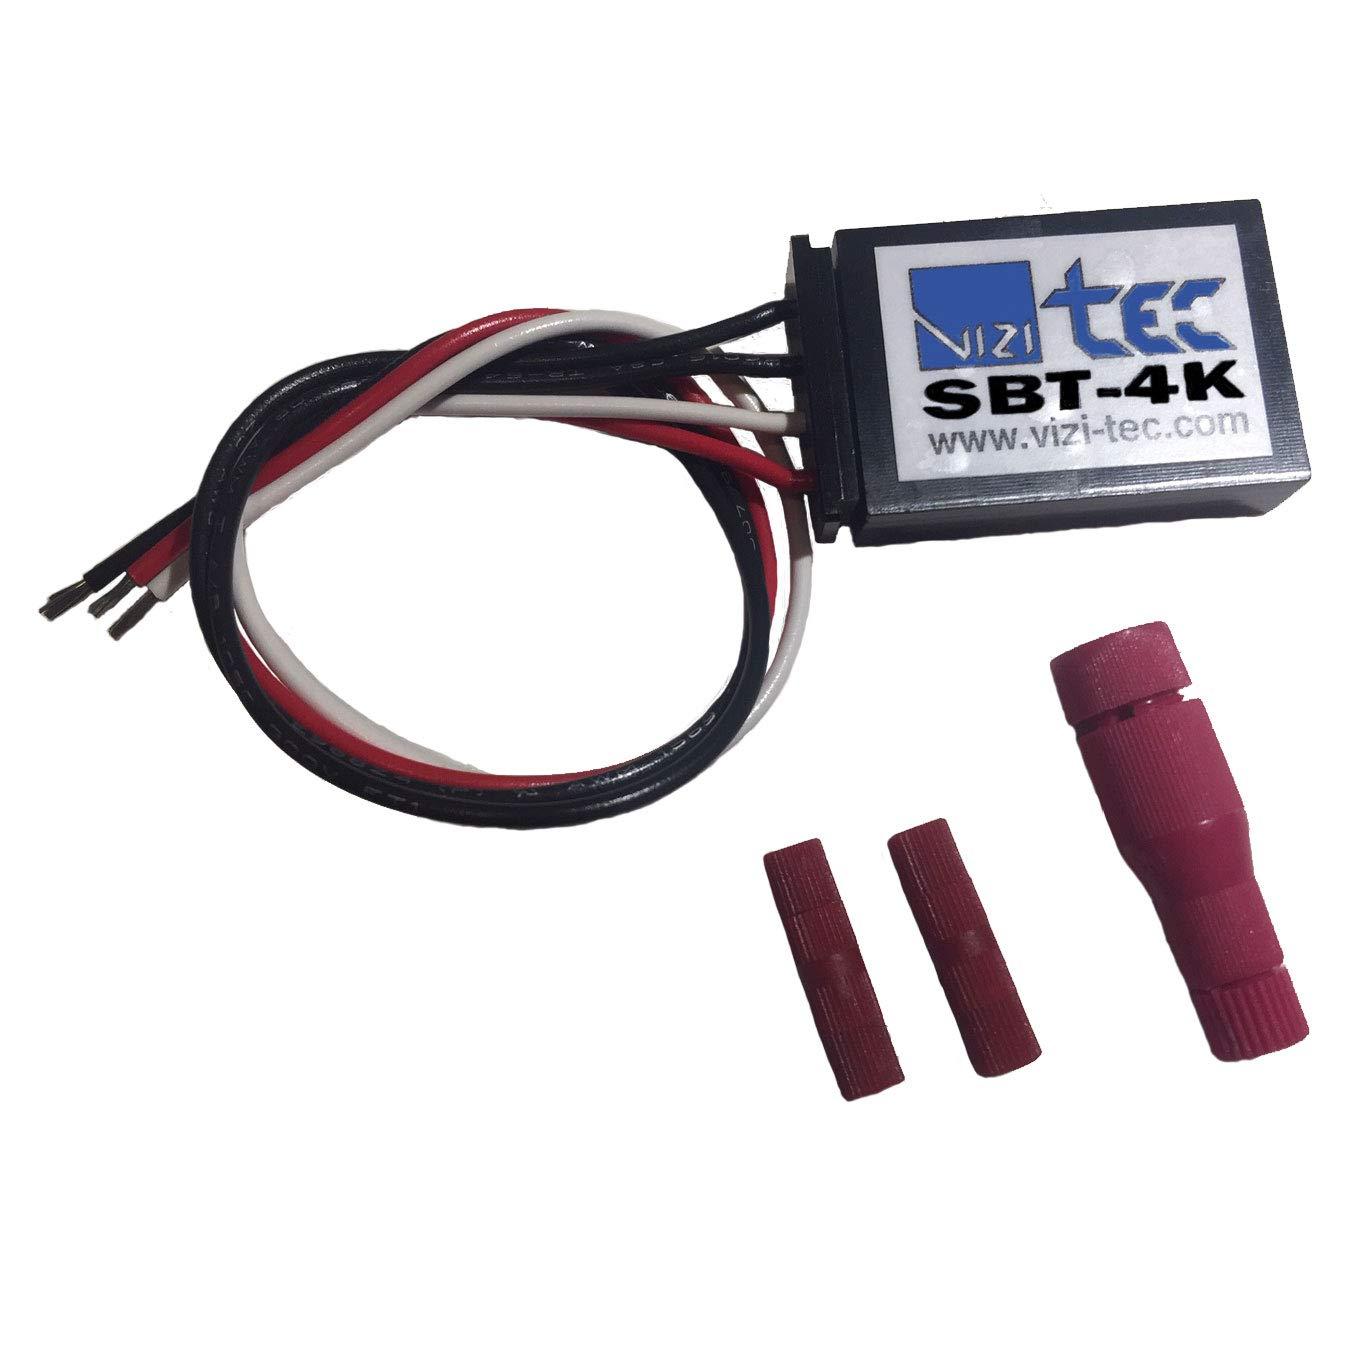 Third Brake Light Modulator for cars and trucks- Vizi-tec SupaBrake SBT-4K by Vizi-Tec (Image #1)